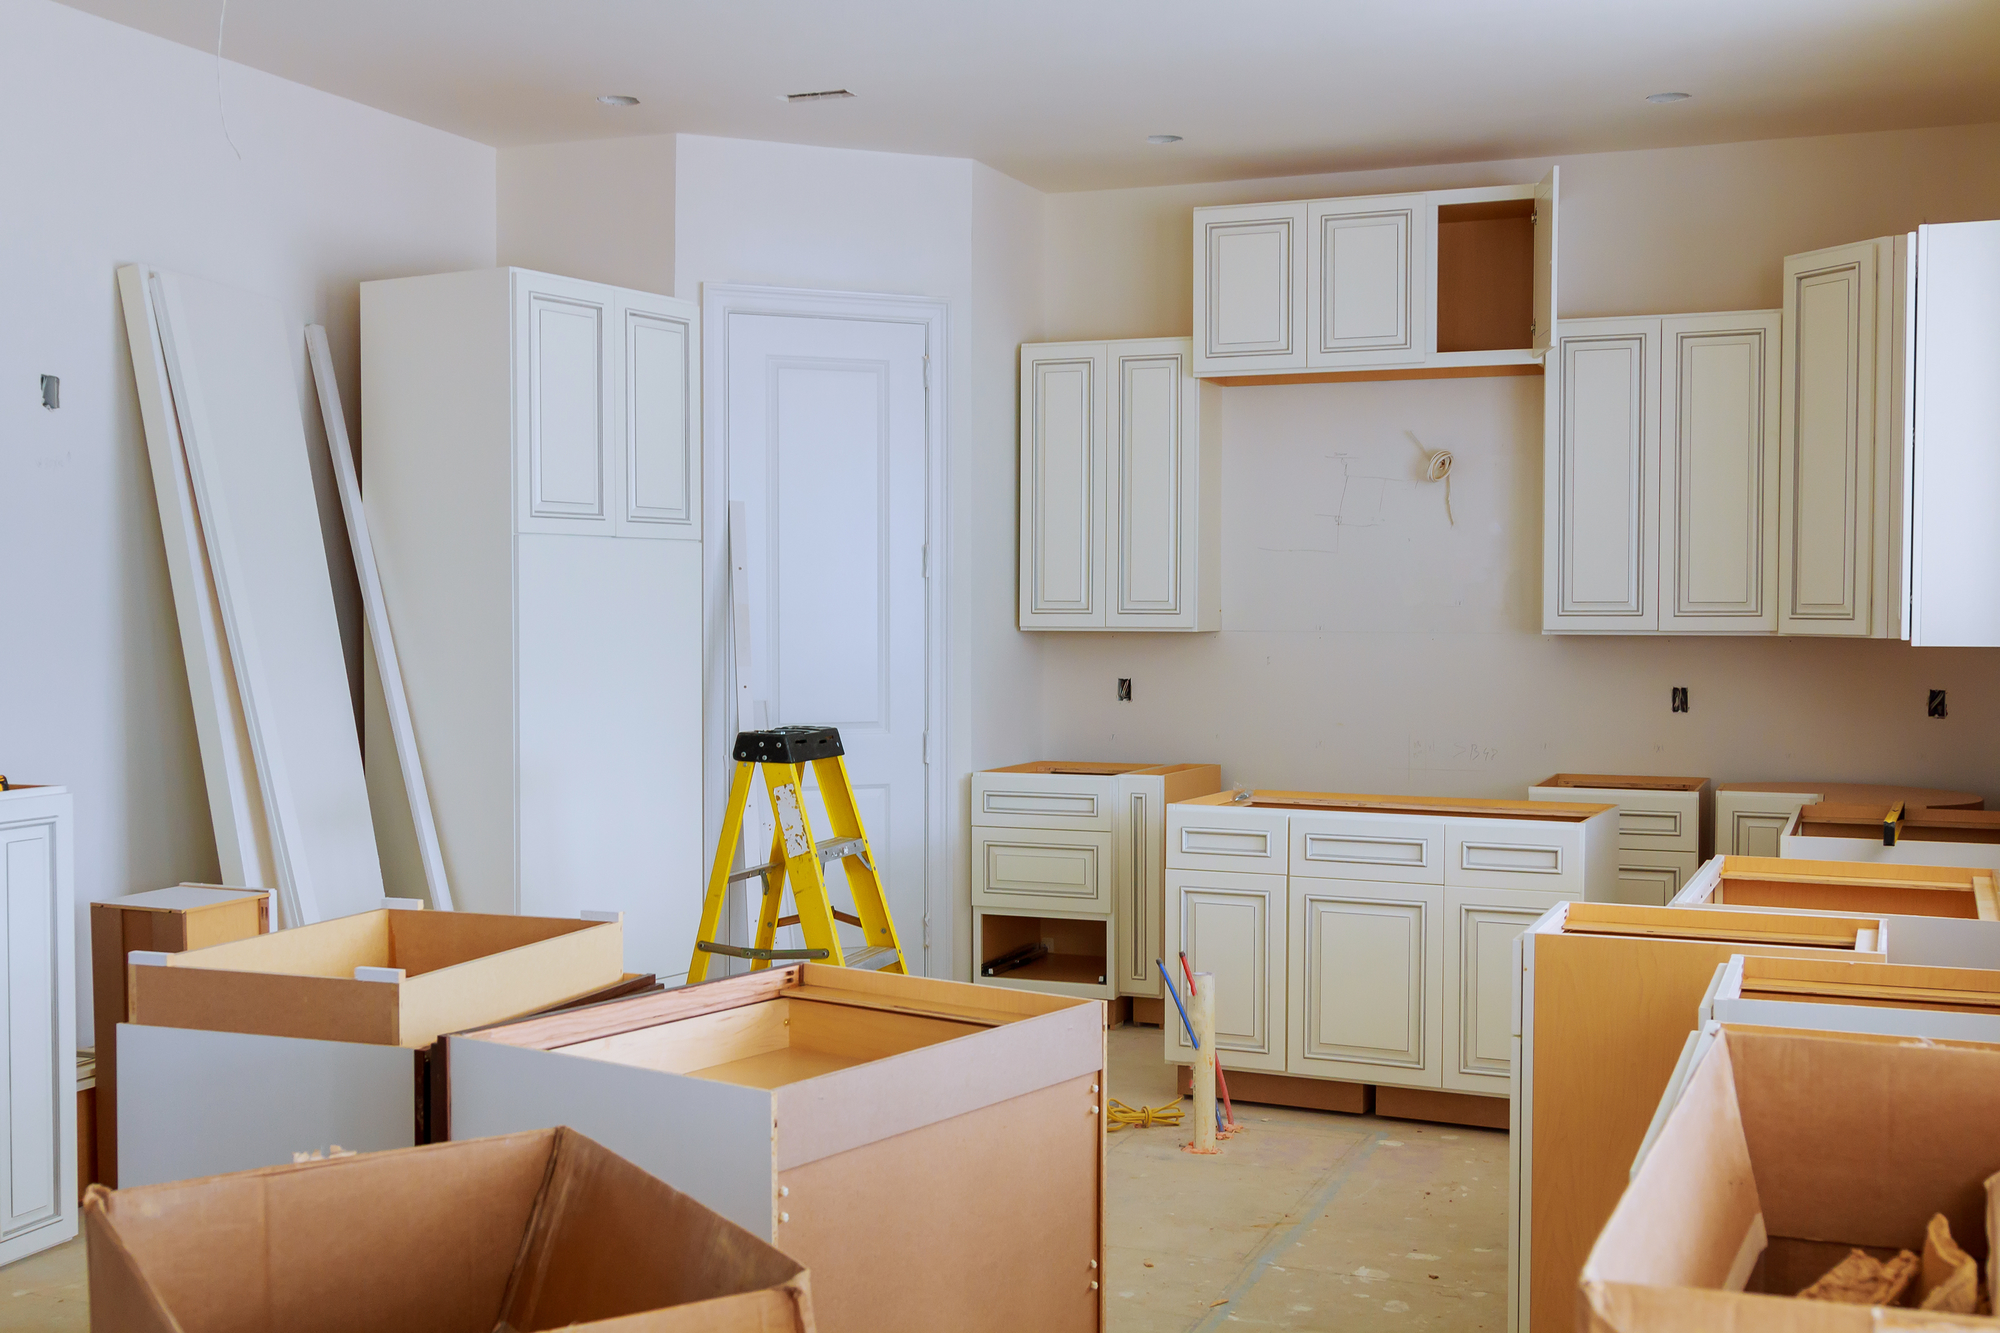 Muebles de Cocina para pintar